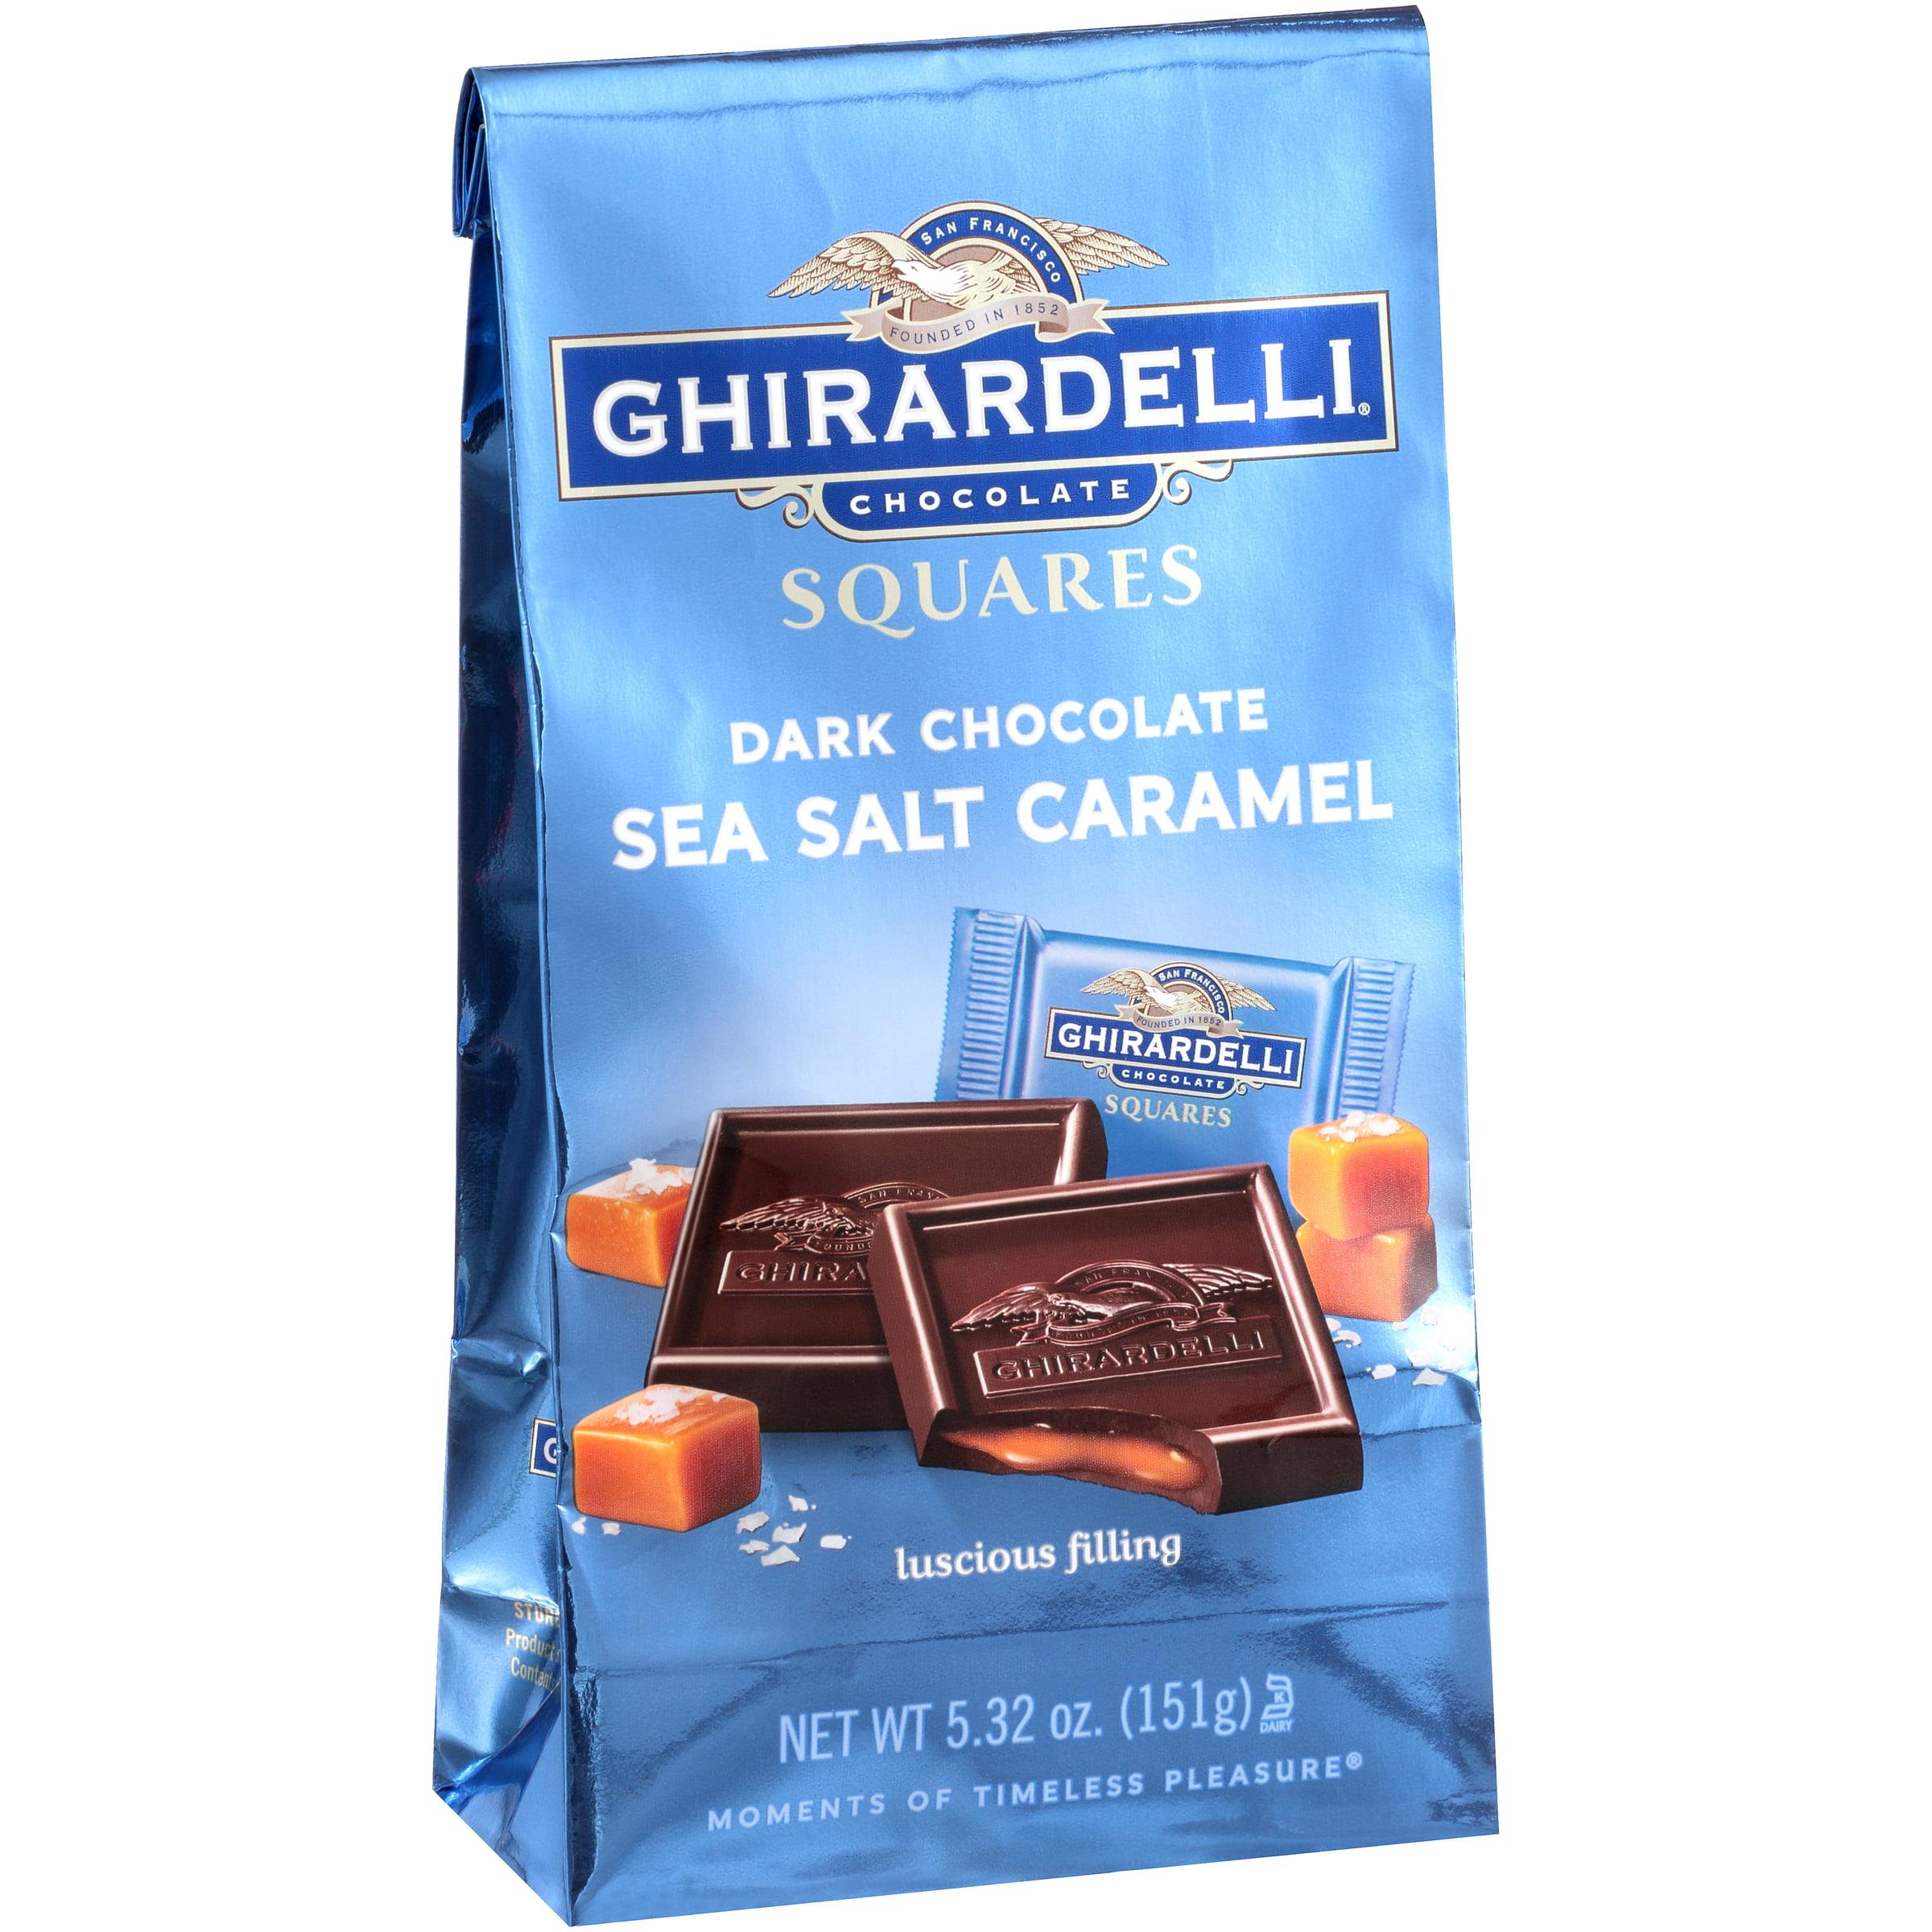 Ghirardelli Dark & Sea Salt Caramel Chocolate Squares, 5.32 oz